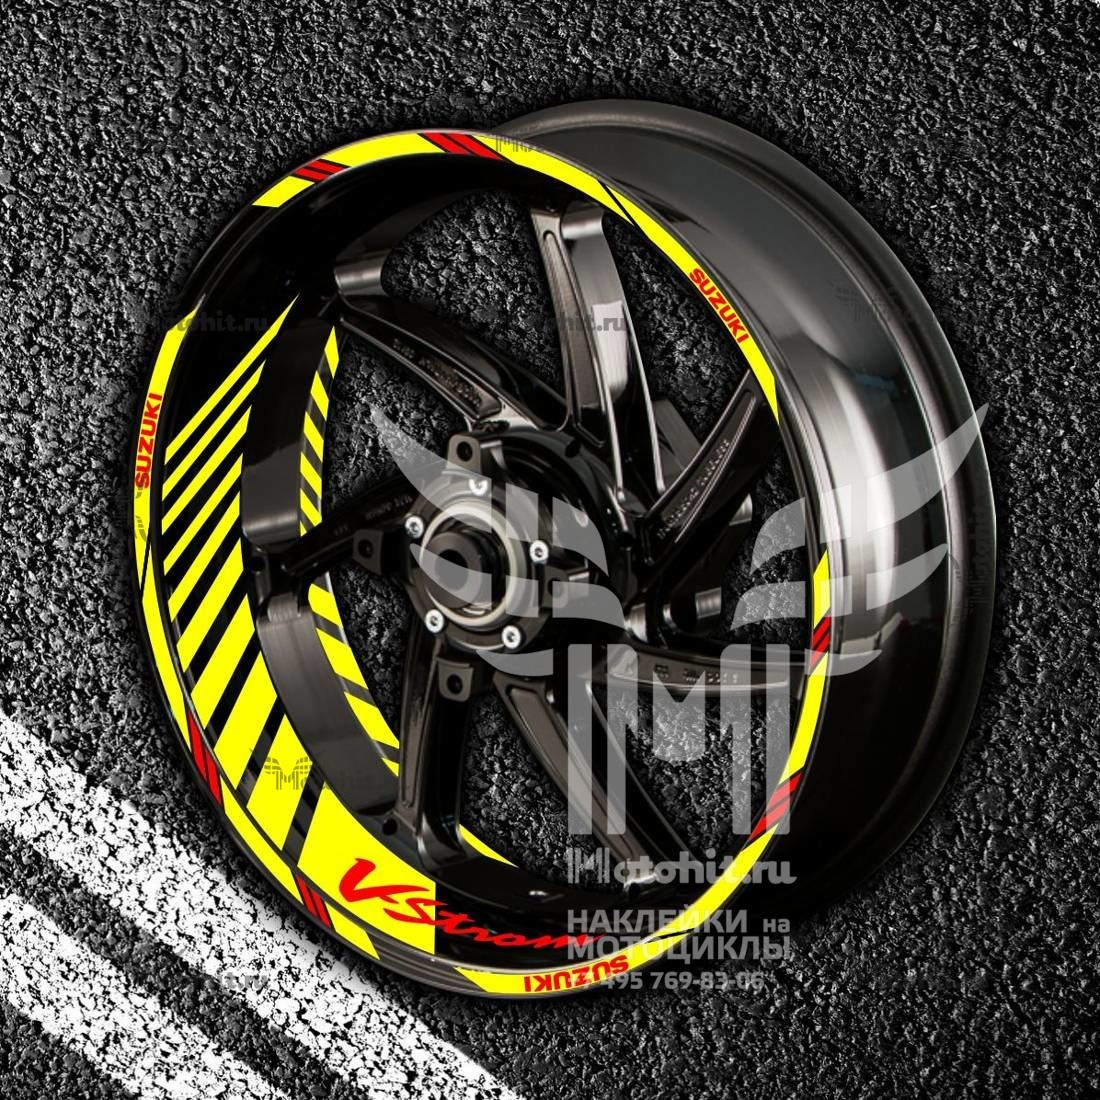 Комплект наклеек с полосами на колеса мотоцикла SUZUKI V-STROM